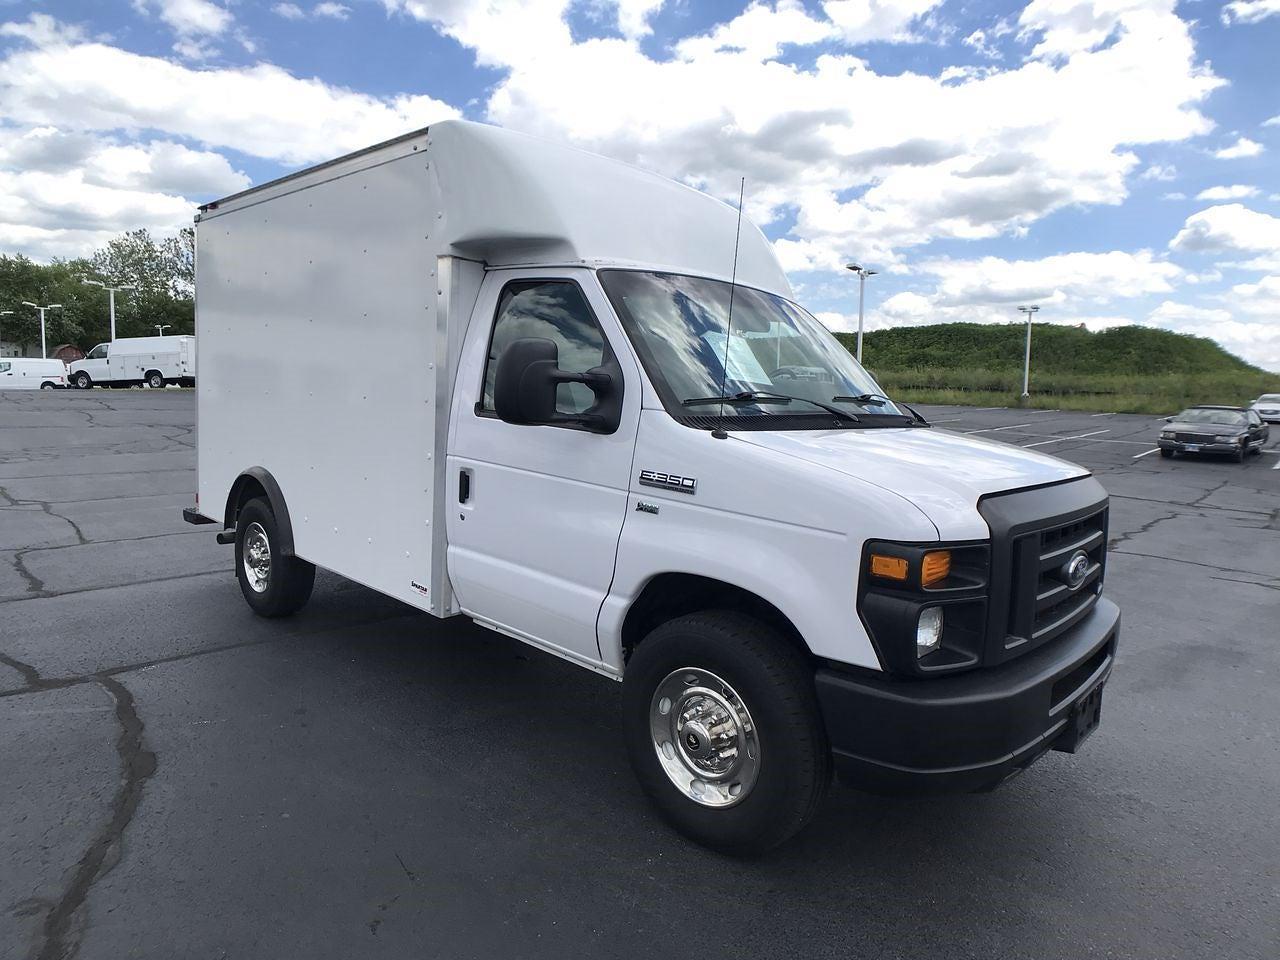 2017 Ford E-350 4x2, Cutaway Van #111895 - photo 1